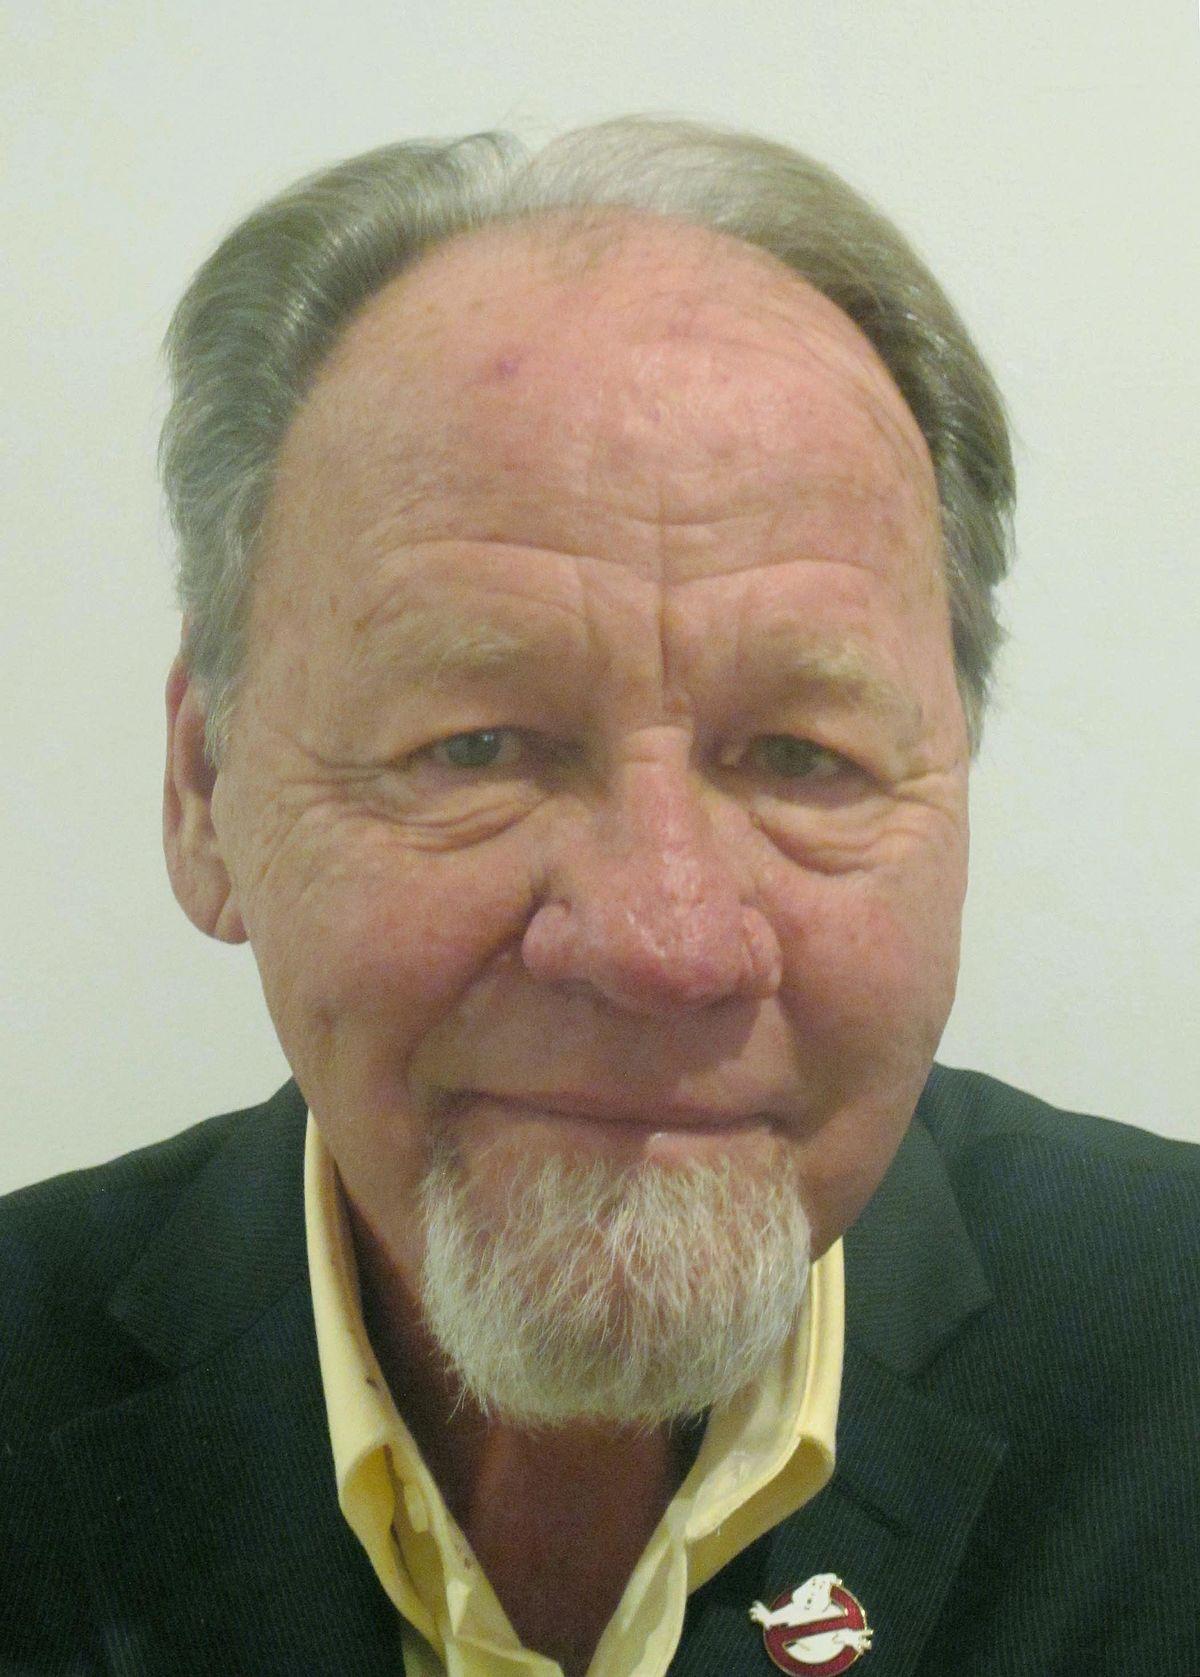 Michael C. Gross - Wikipedia